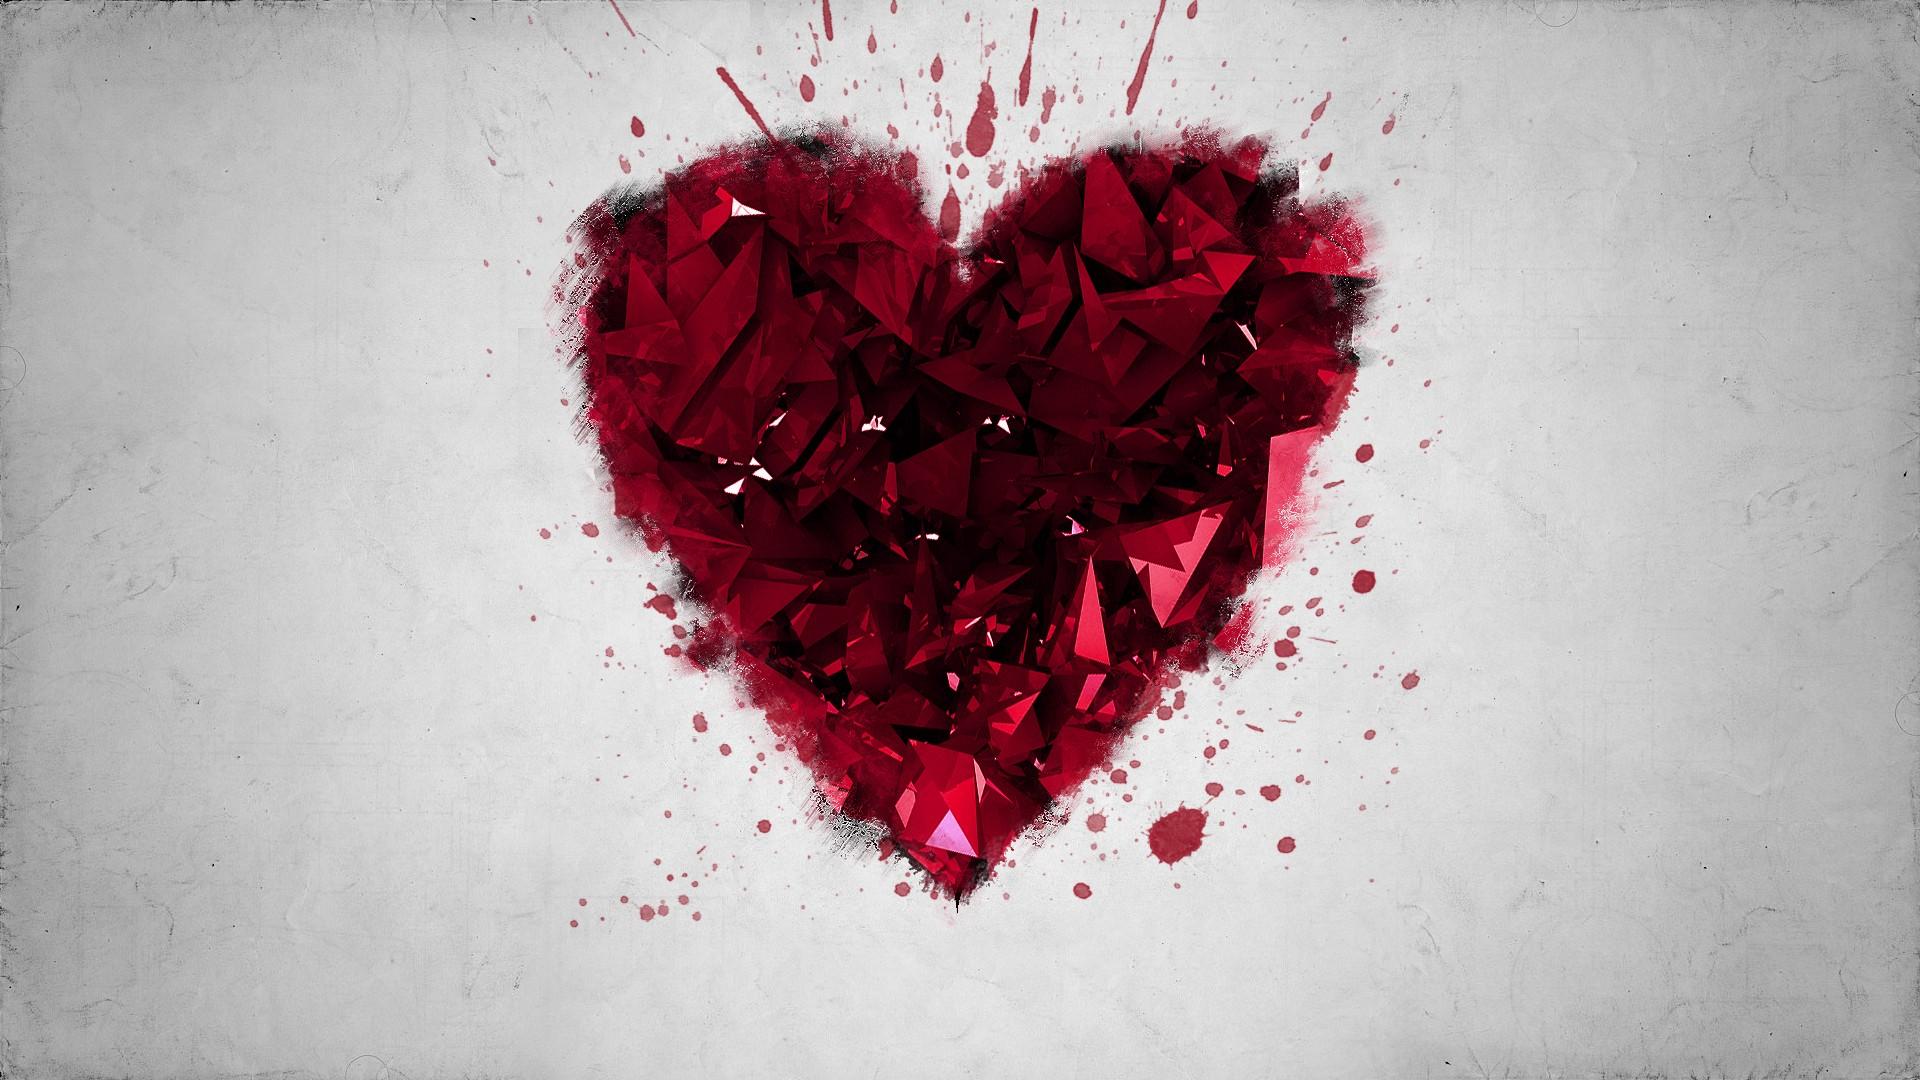 Разбитое сердце картинки черно белые обои